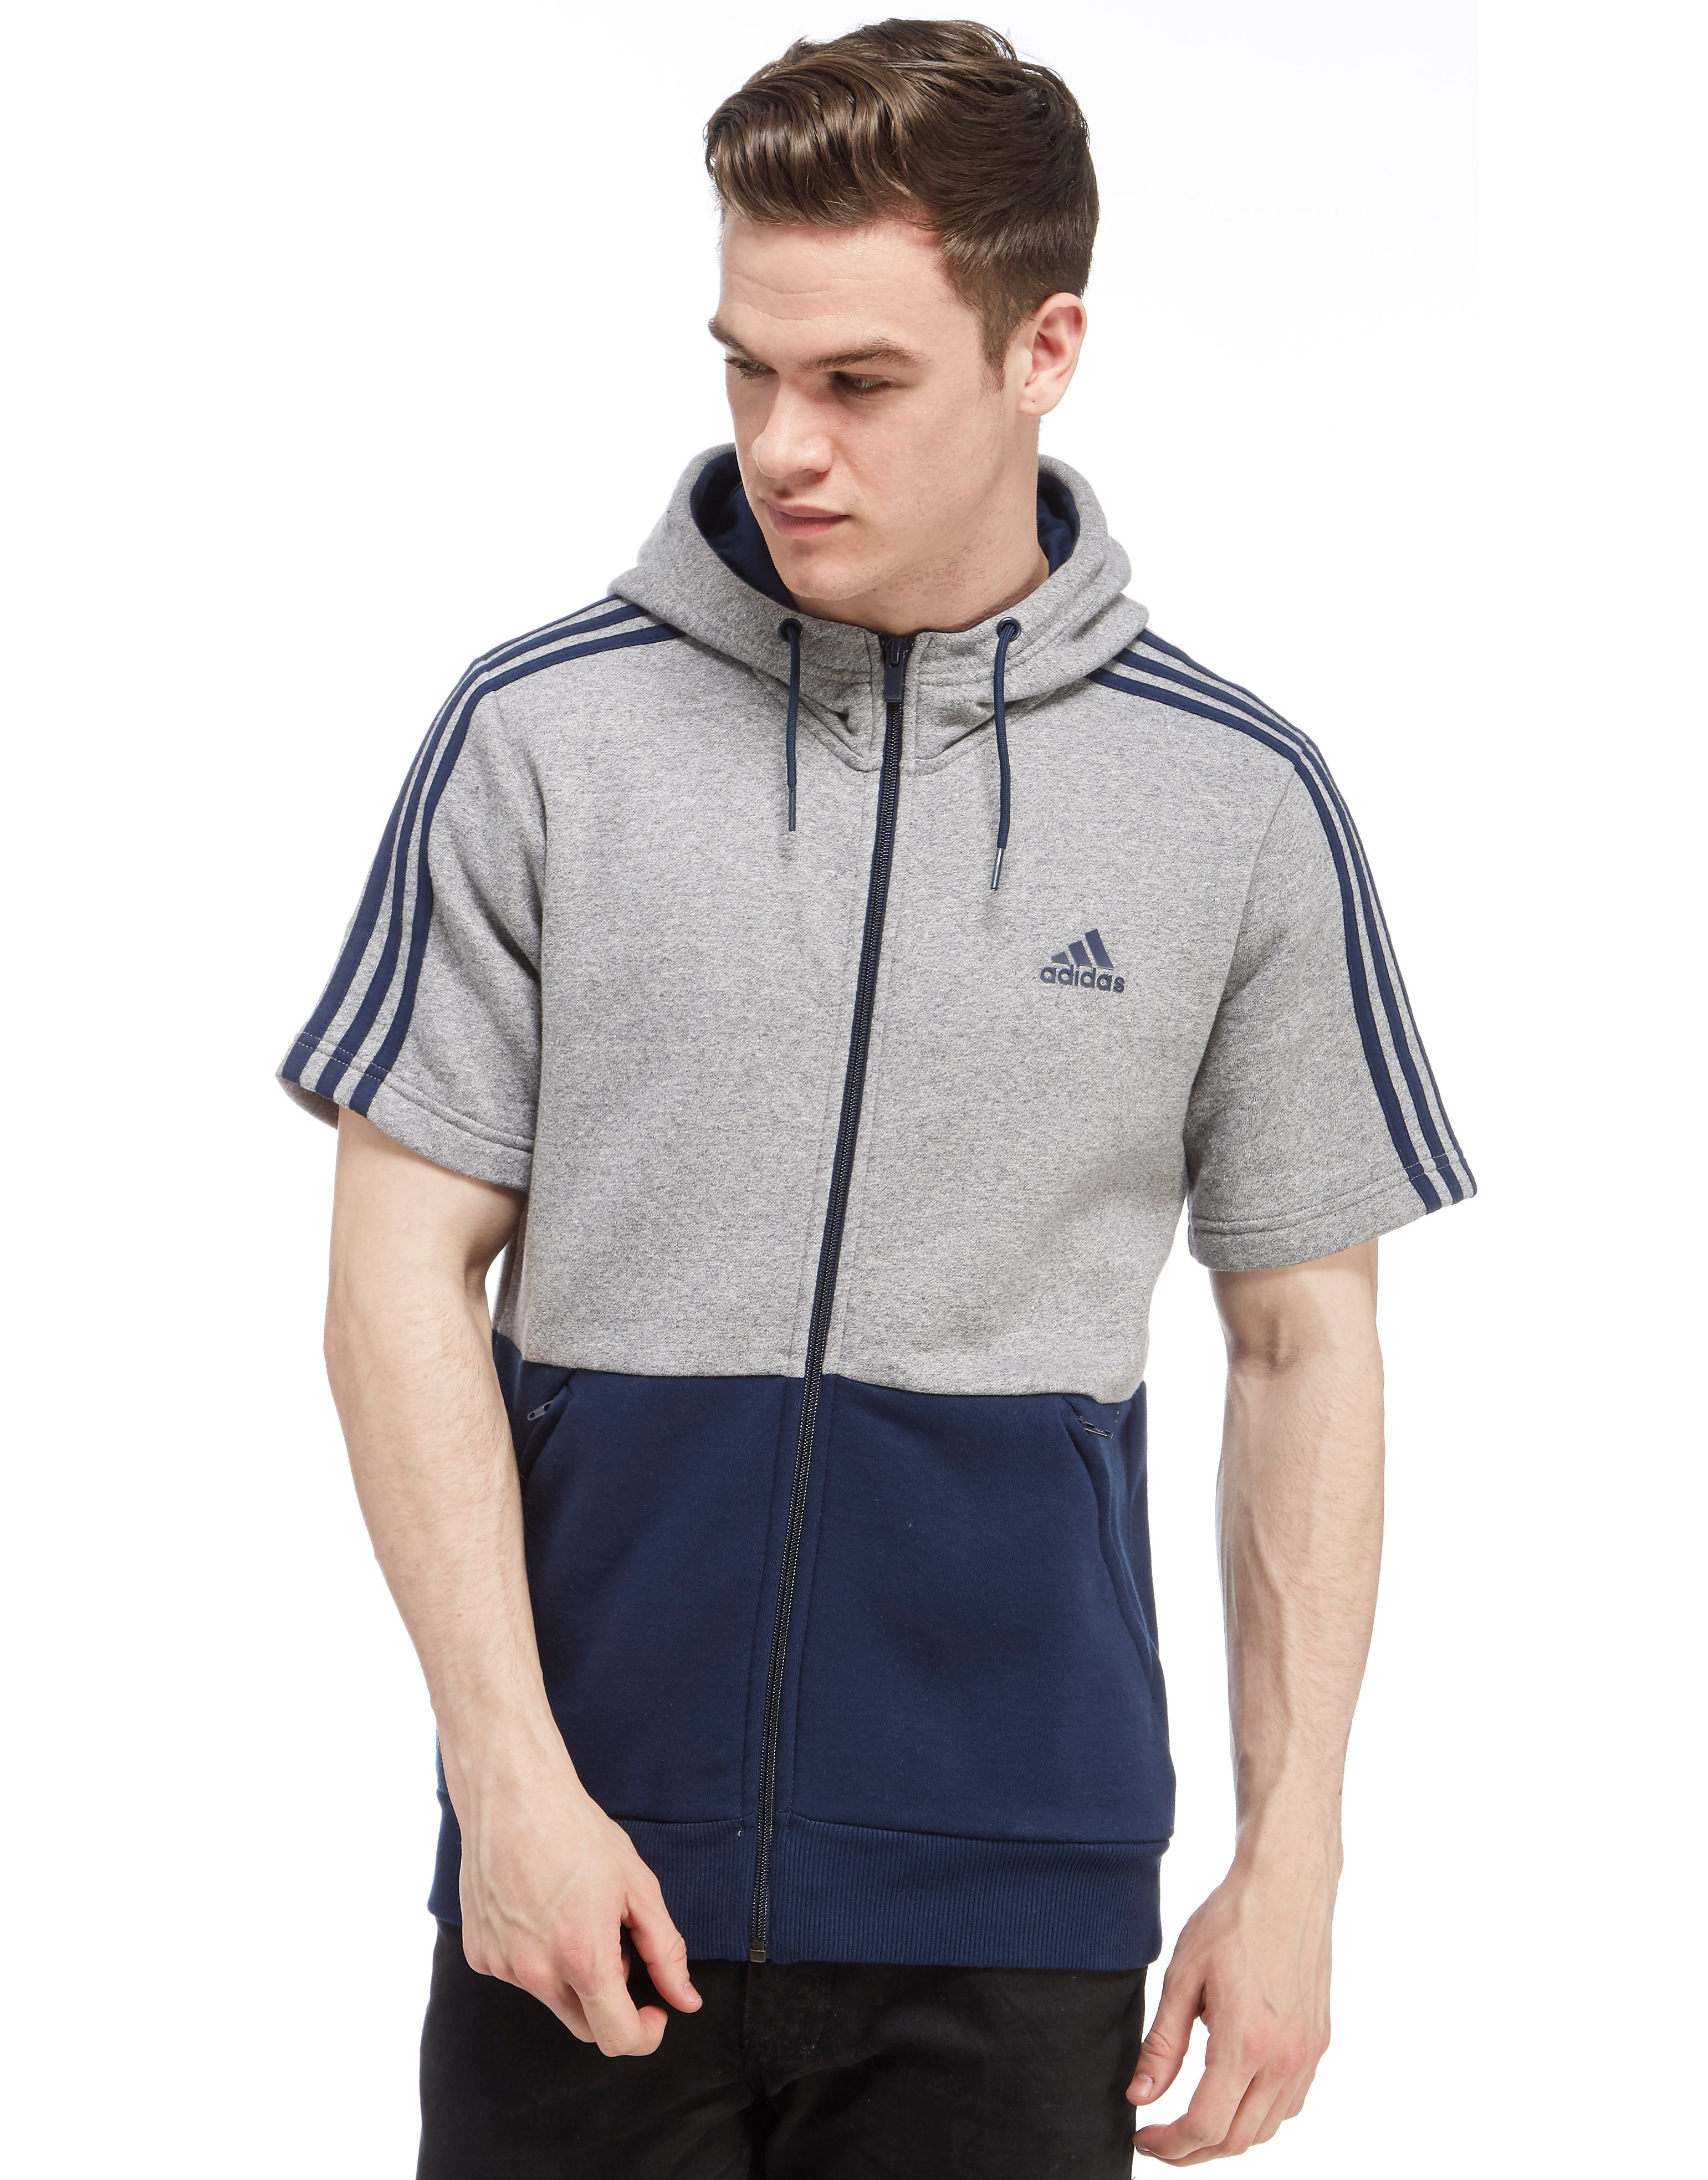 adidas Linear Short Sleeve Hoody